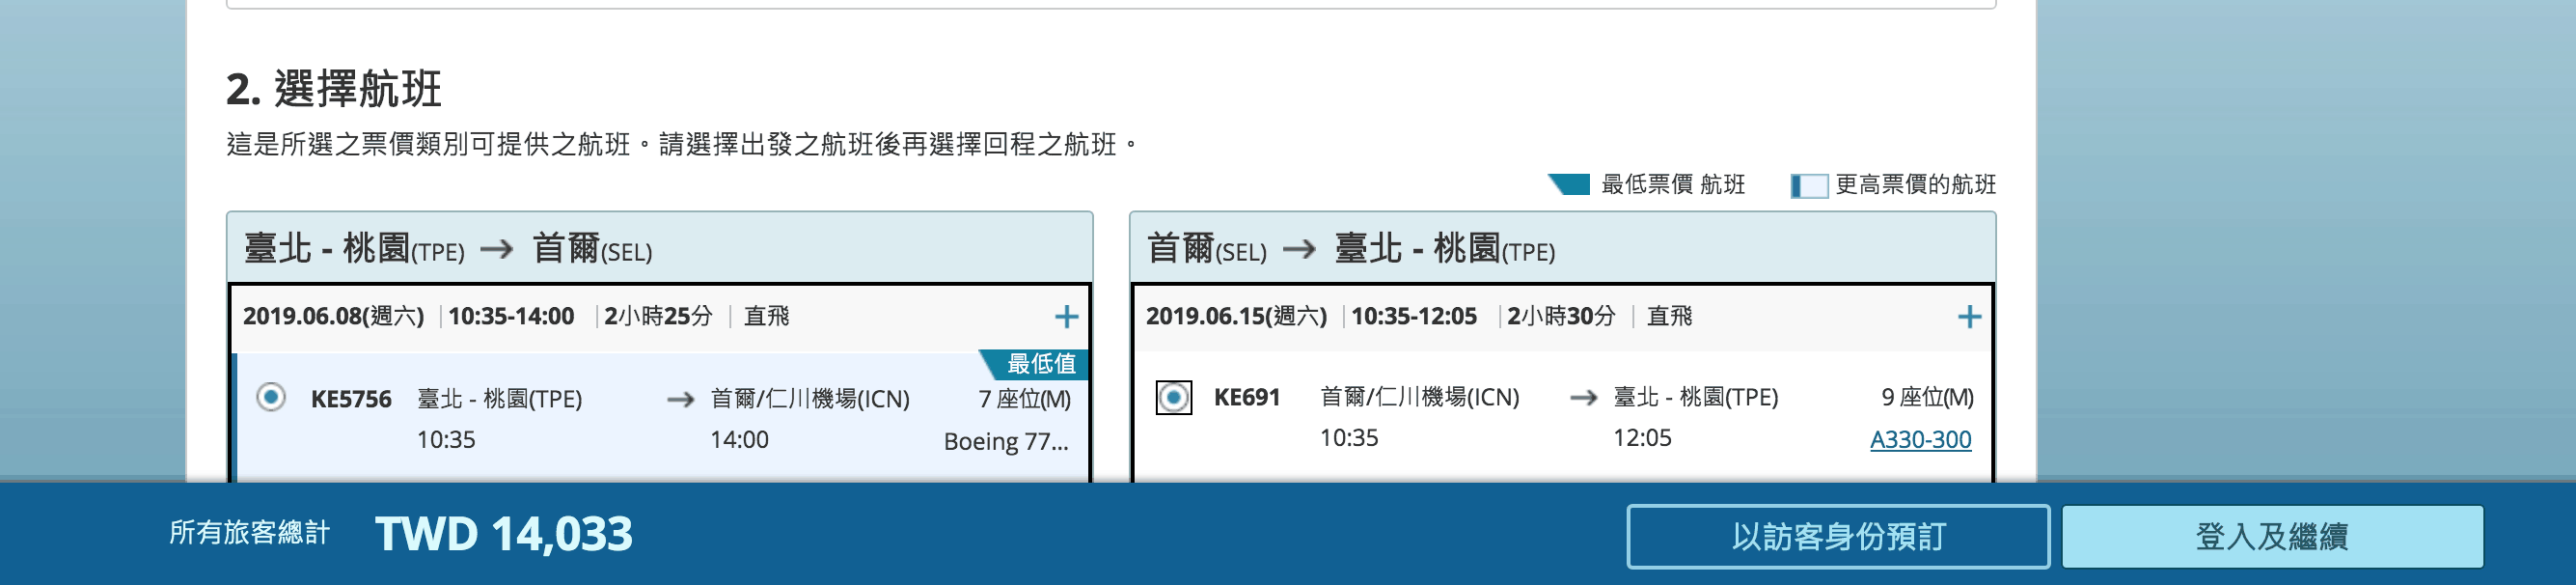 trip.com訂機票 - 價差示範 / 台北往首爾 大韓航空